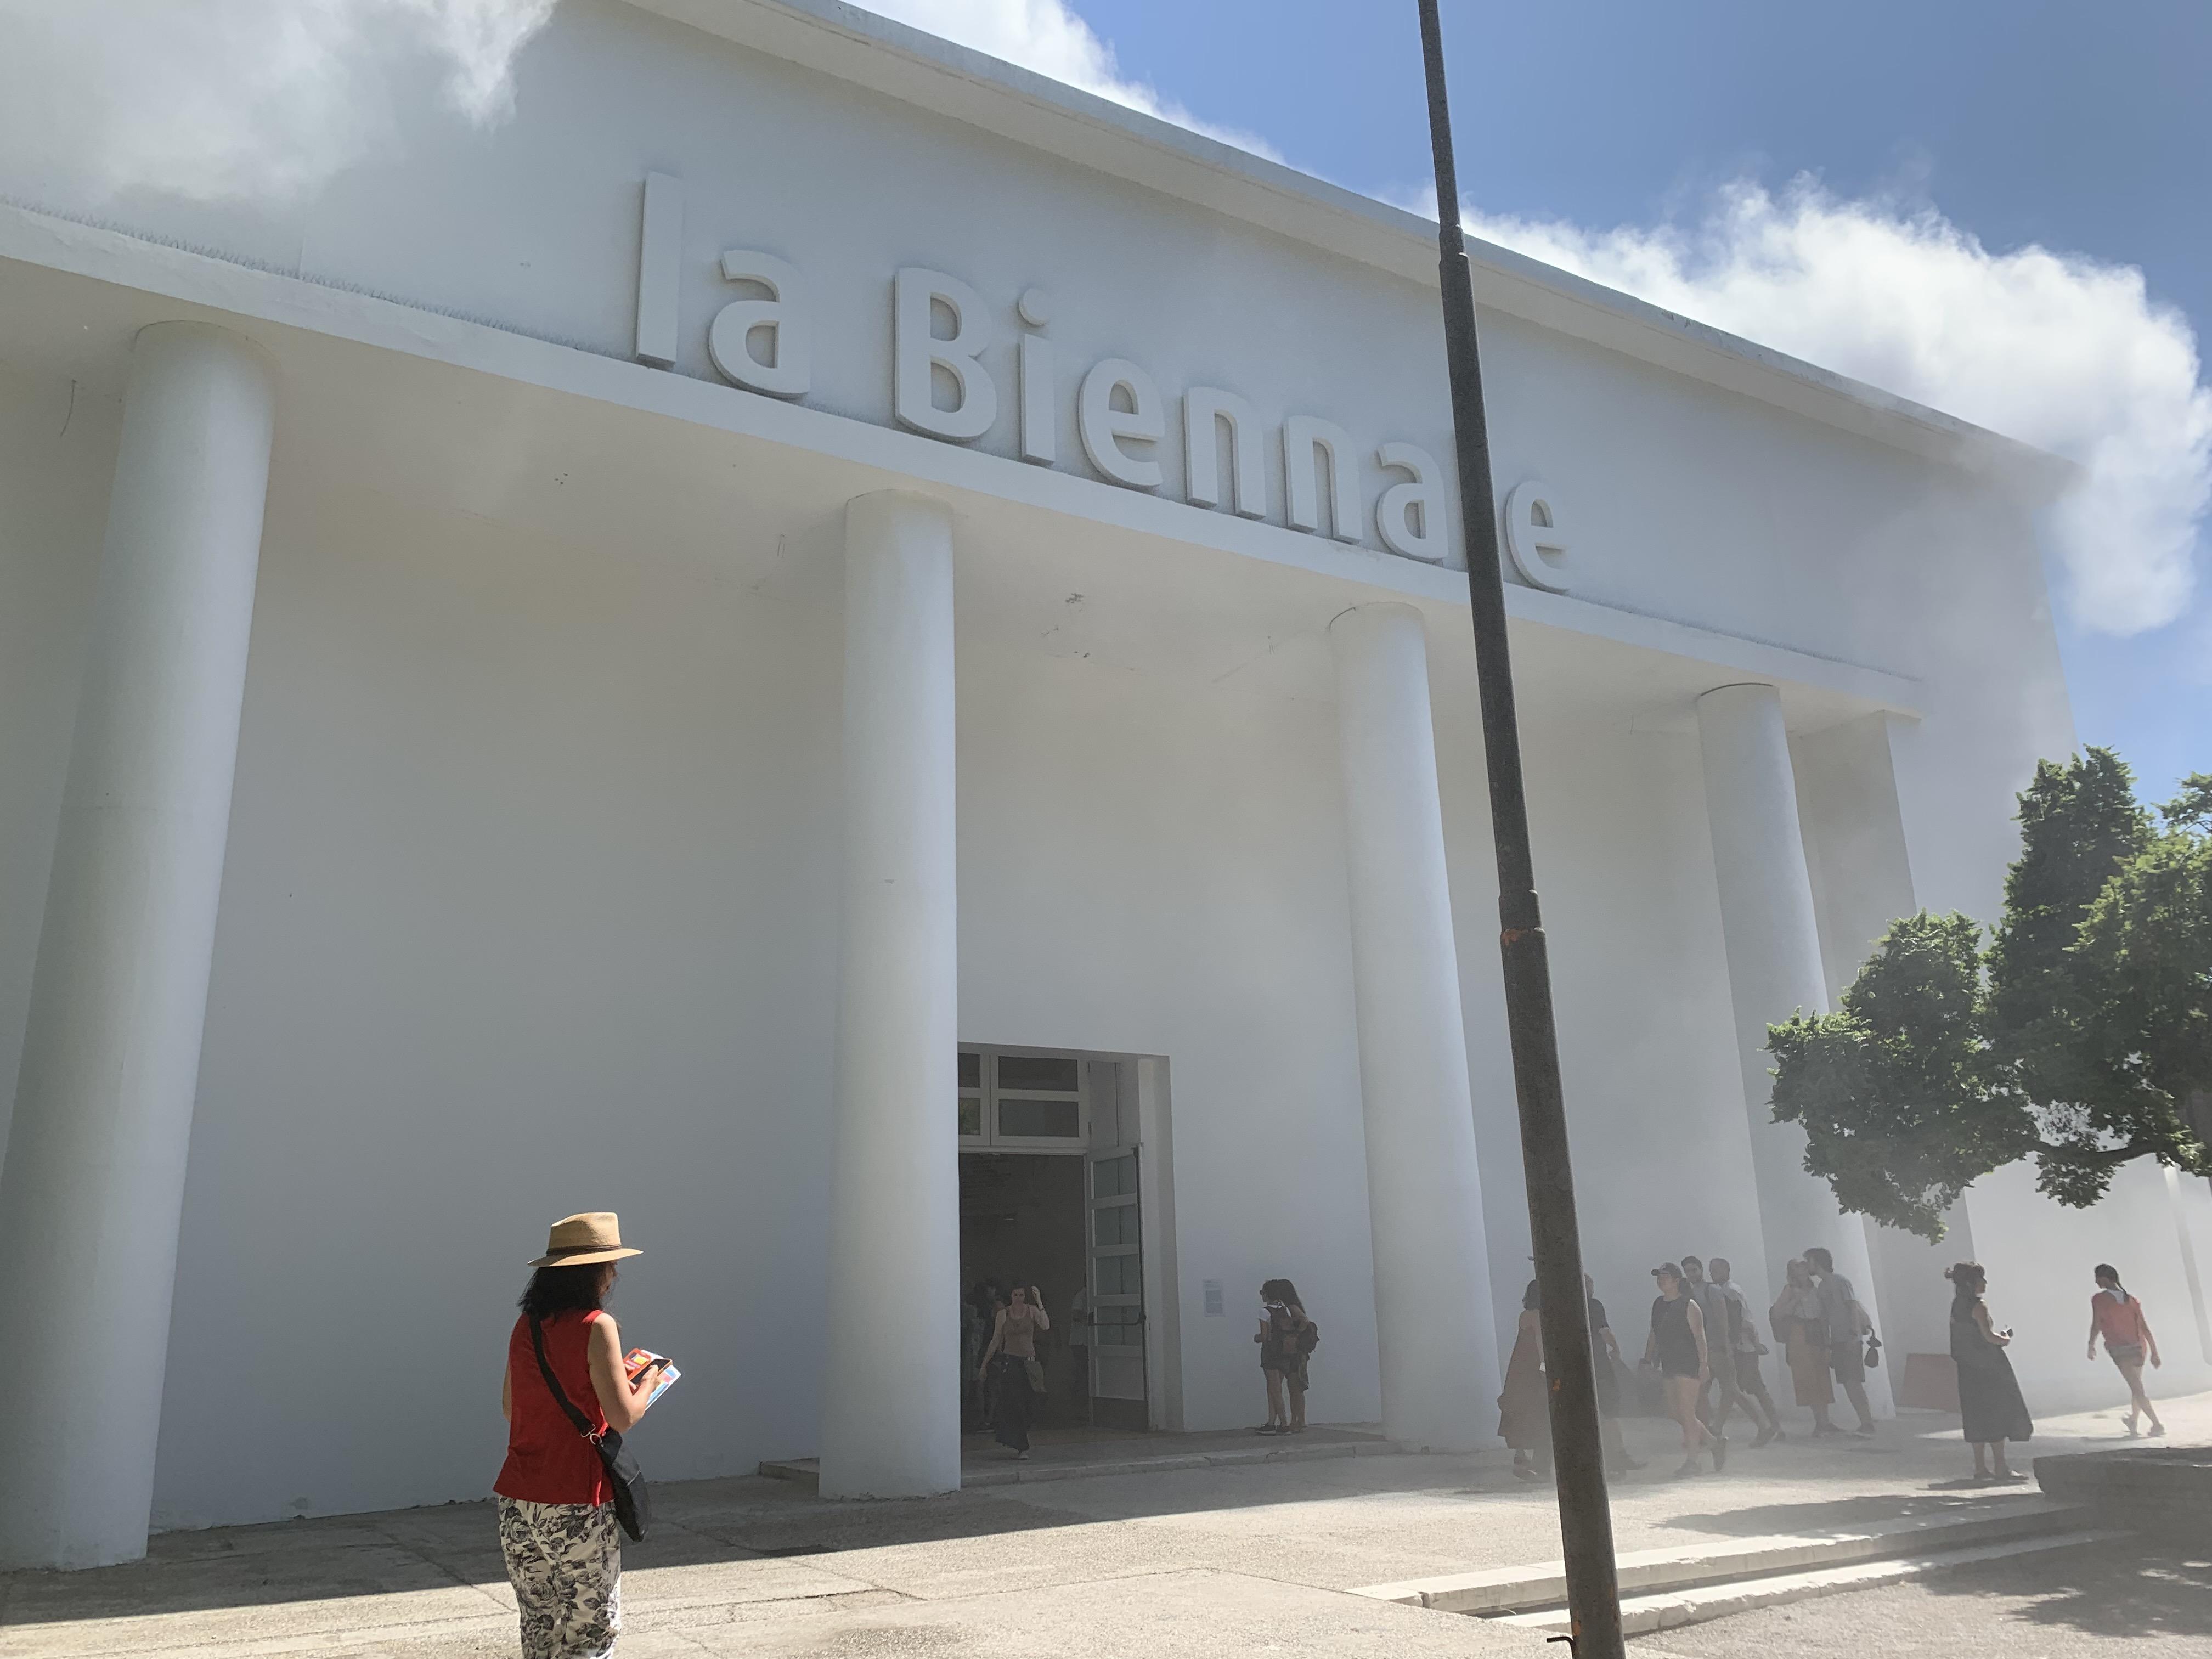 Biennale Arte, Venezia 2019